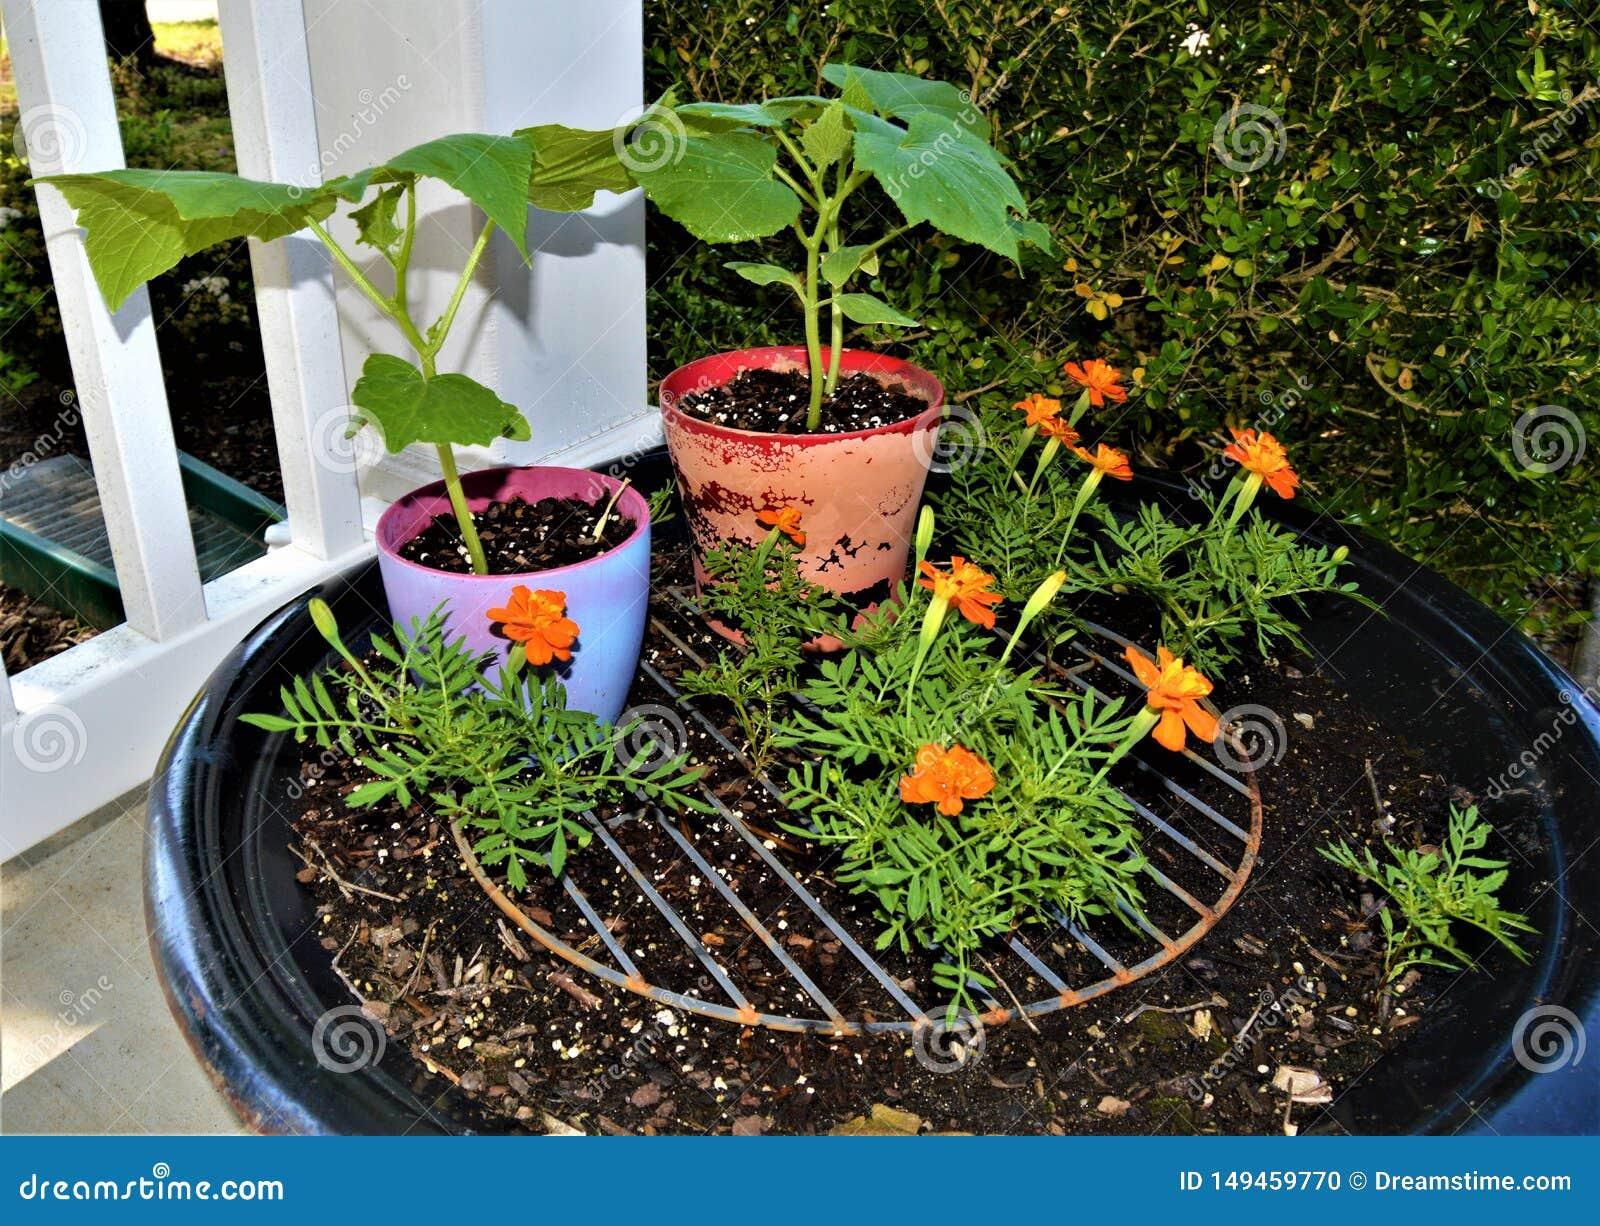 Orange Marigolds with Other Plants